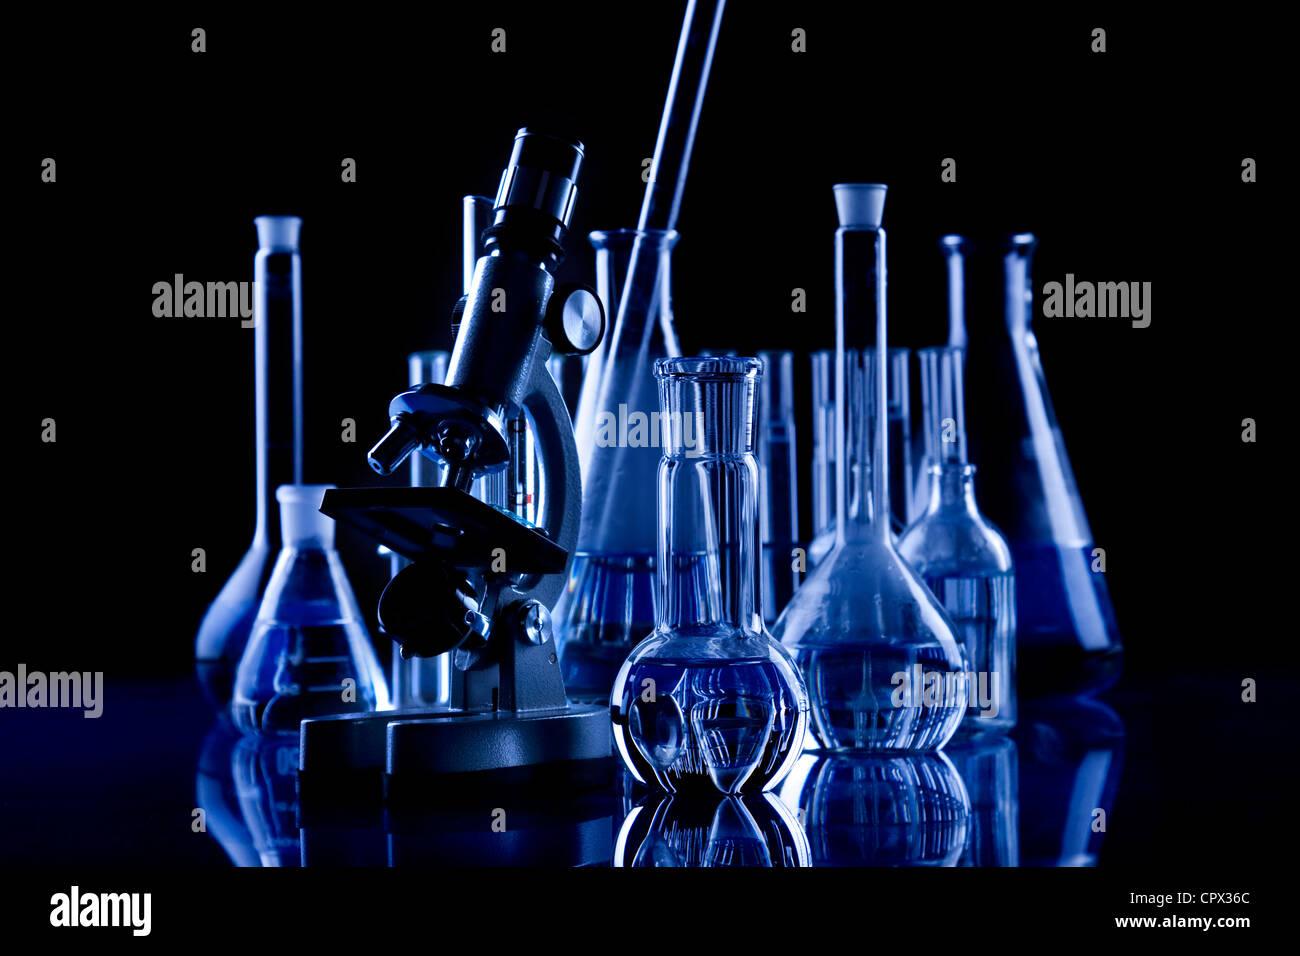 Verrerie de laboratoire Photo Stock